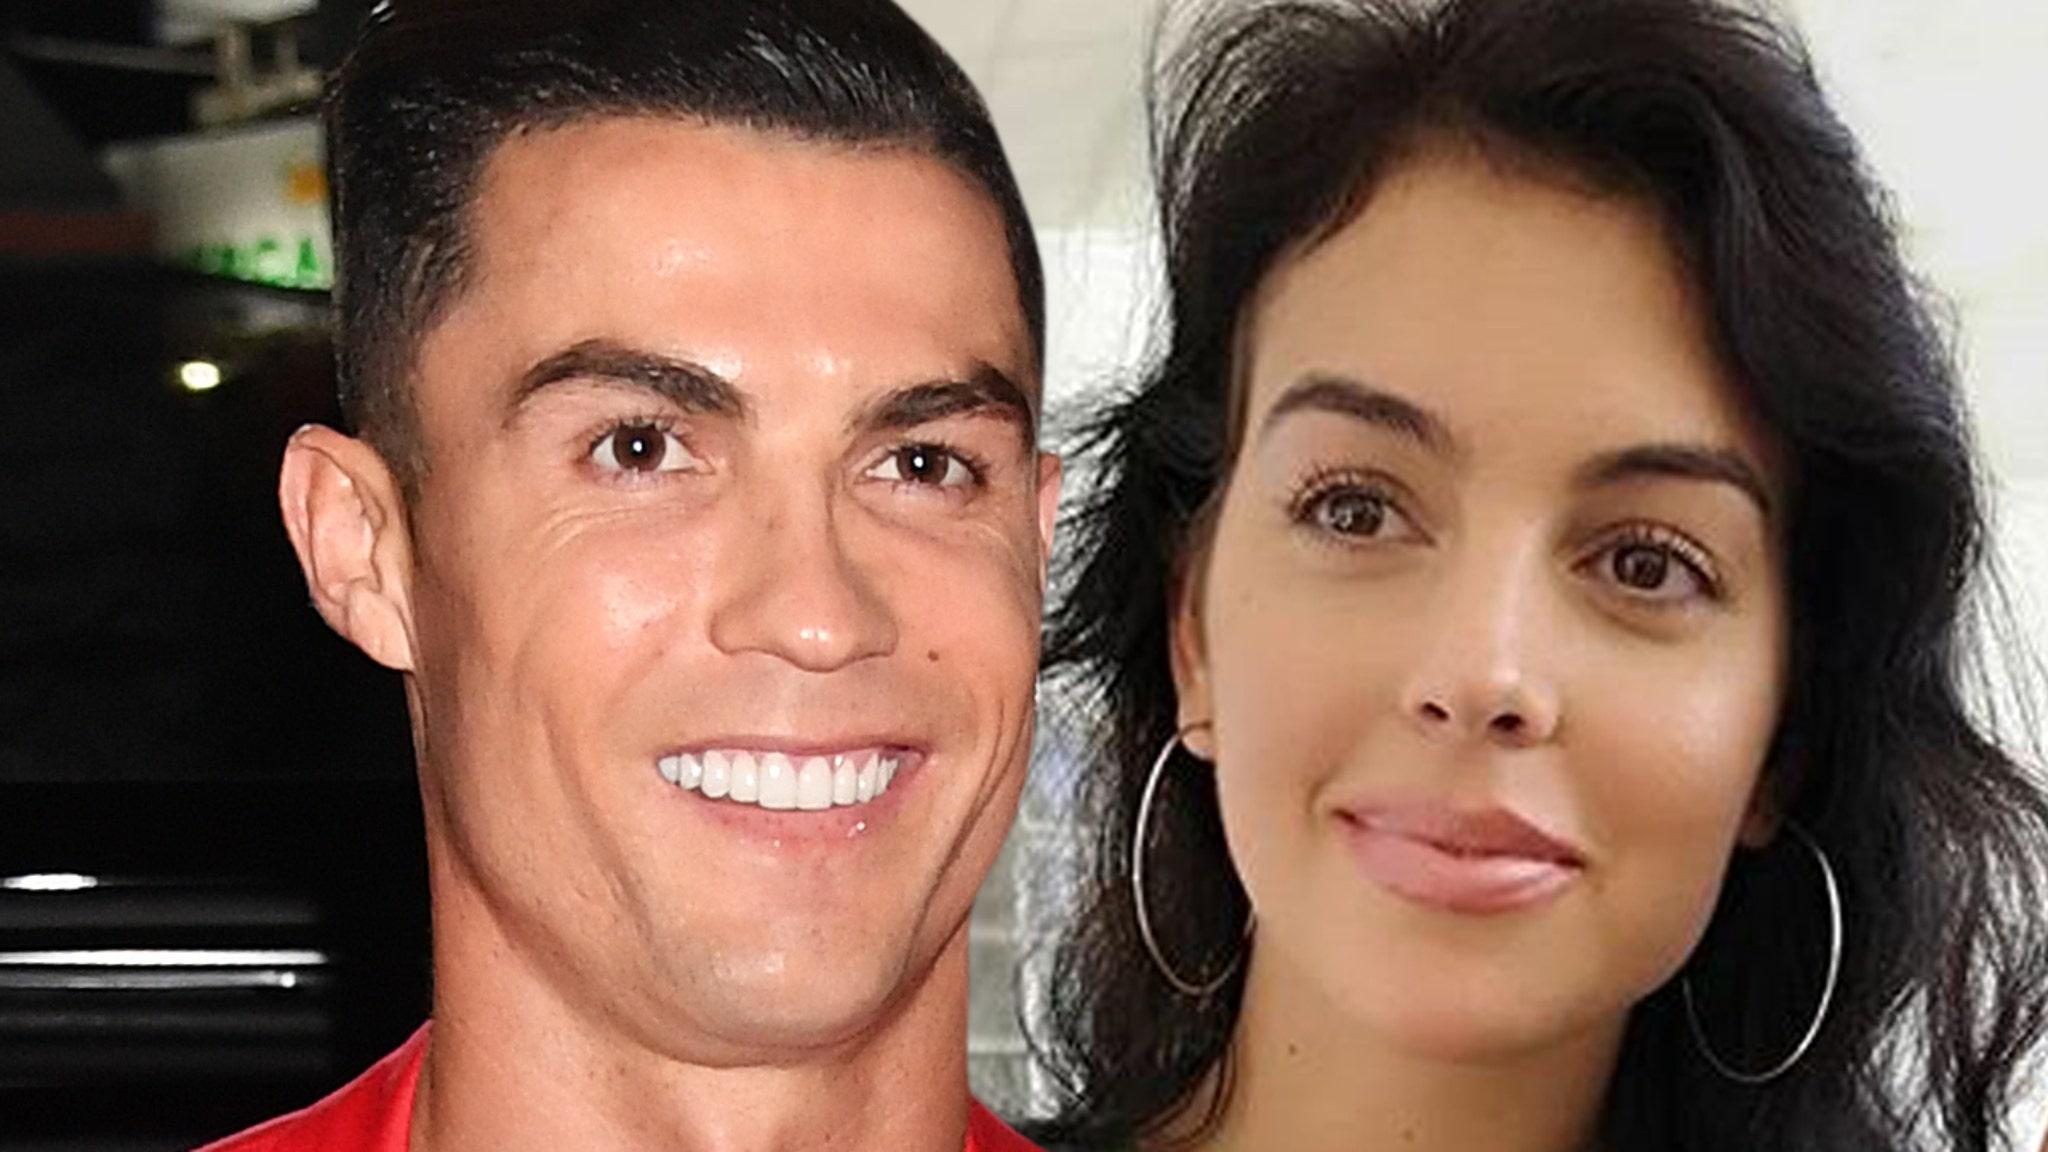 Cristiano Ronaldo Shoots Down Secret Wedding Reports, I'm Not Married!